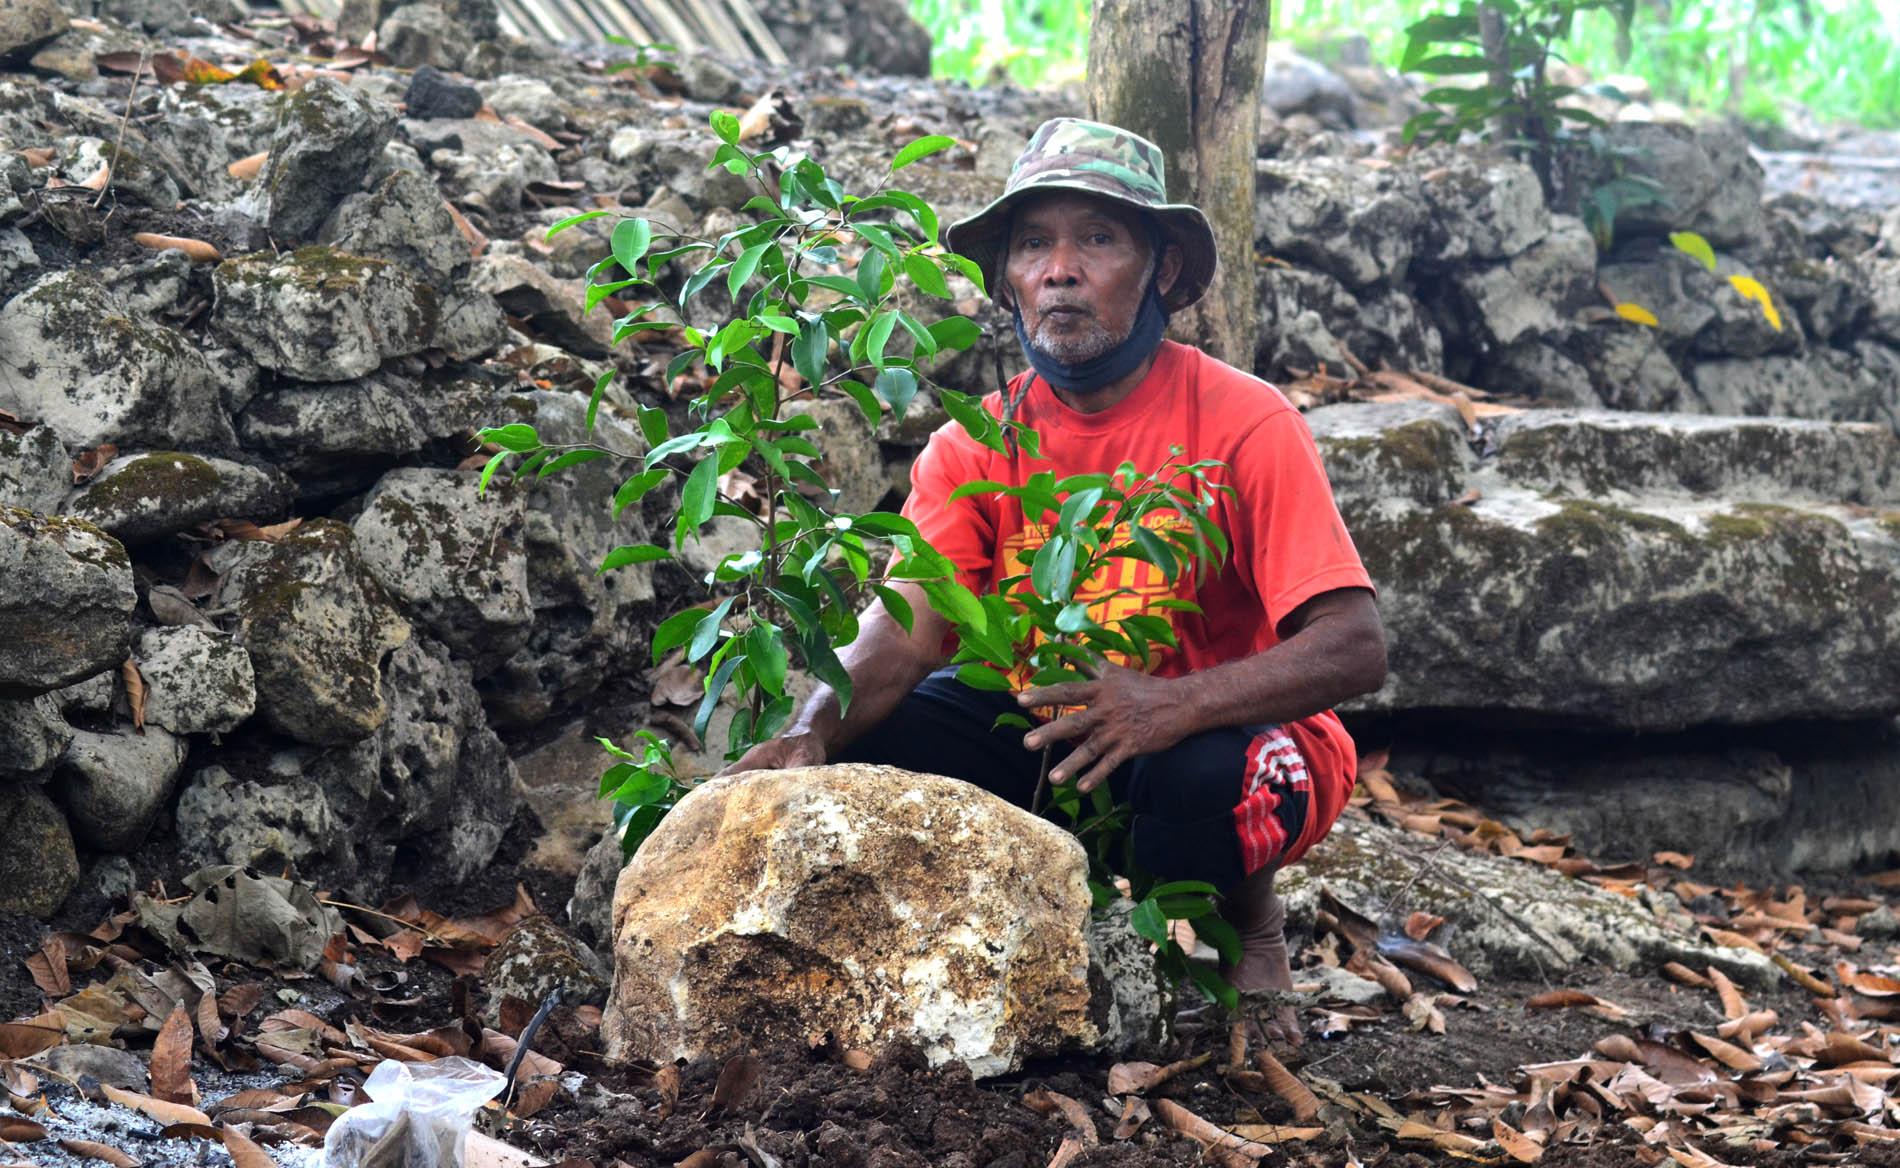 Mbah Juru Kunci melakukan penanaman ficus di Sumber Beji. Foto: Padmo